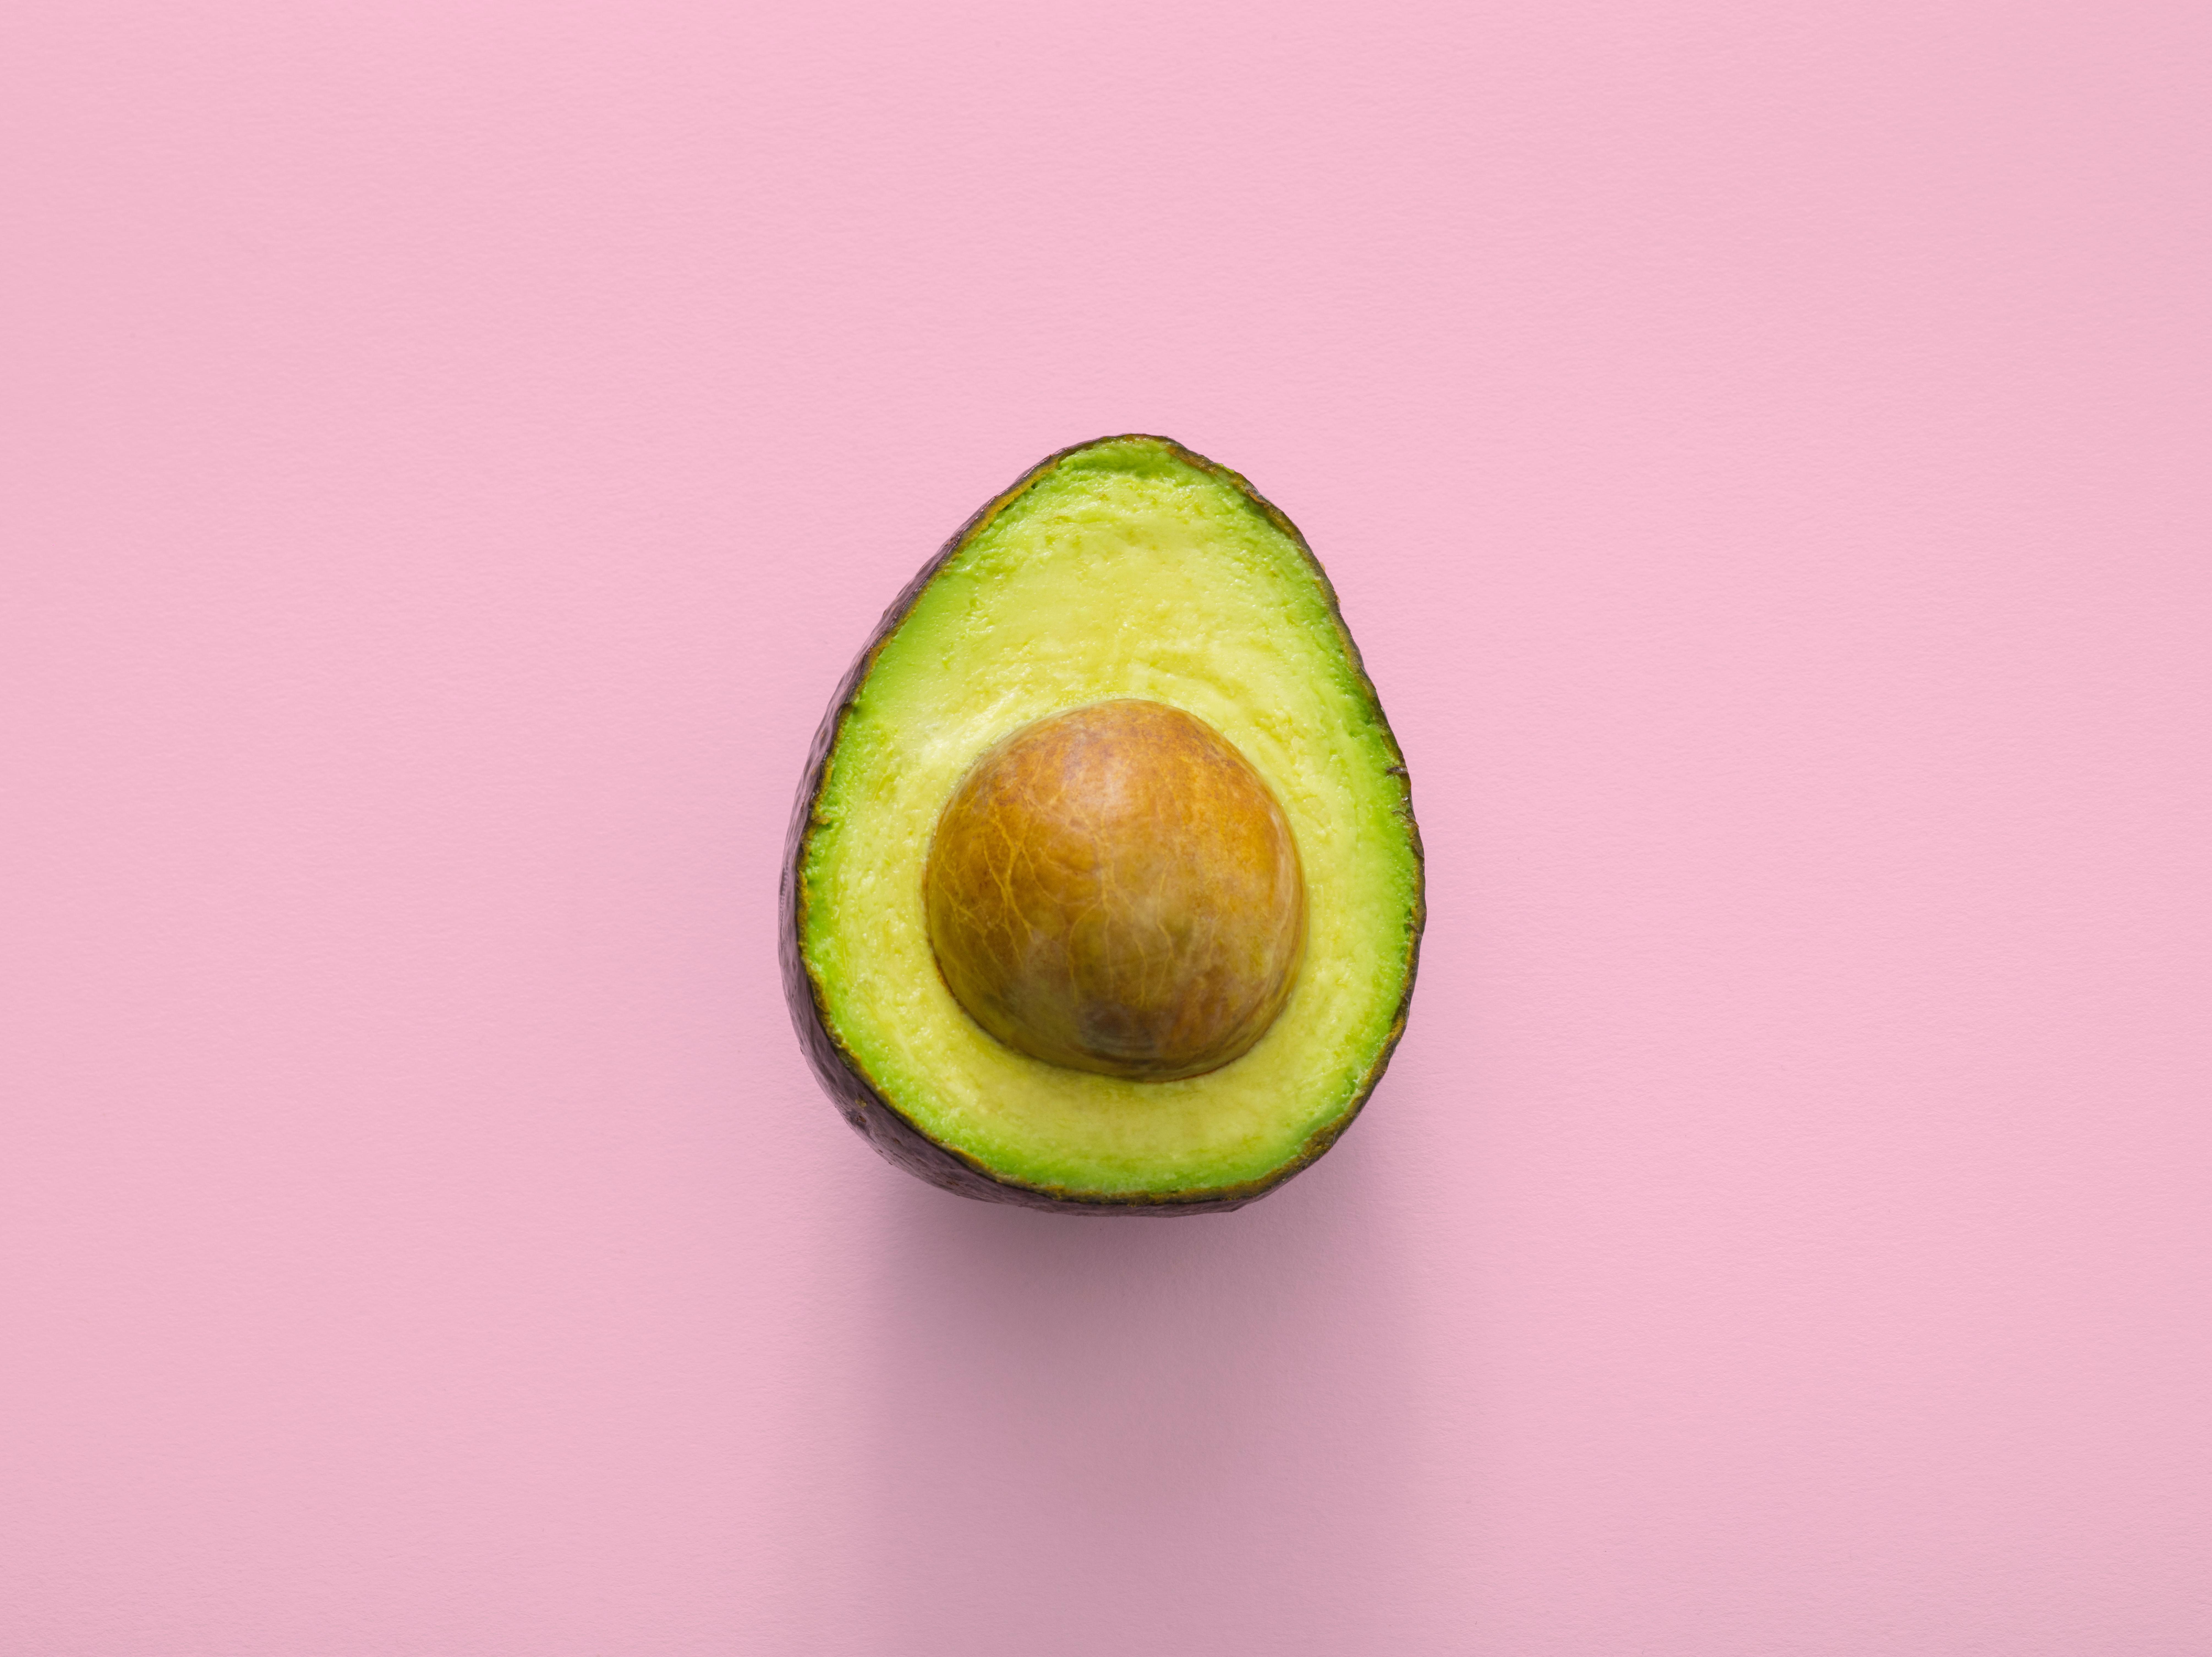 Avocado production companies, product companies